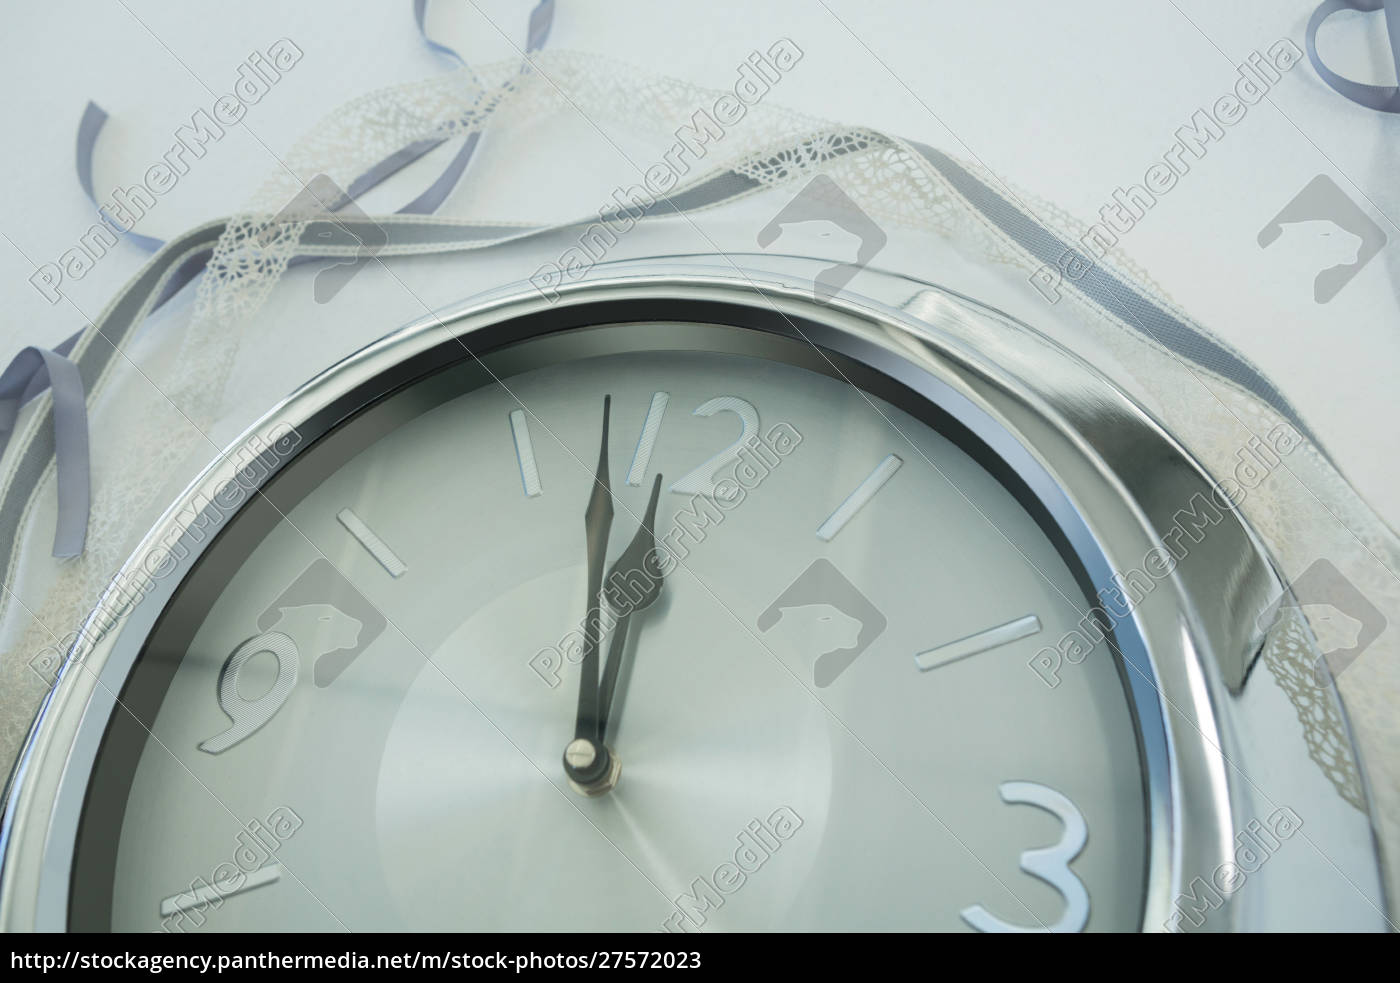 clock, hands, reaching, 12, clock, midnight - 27572023